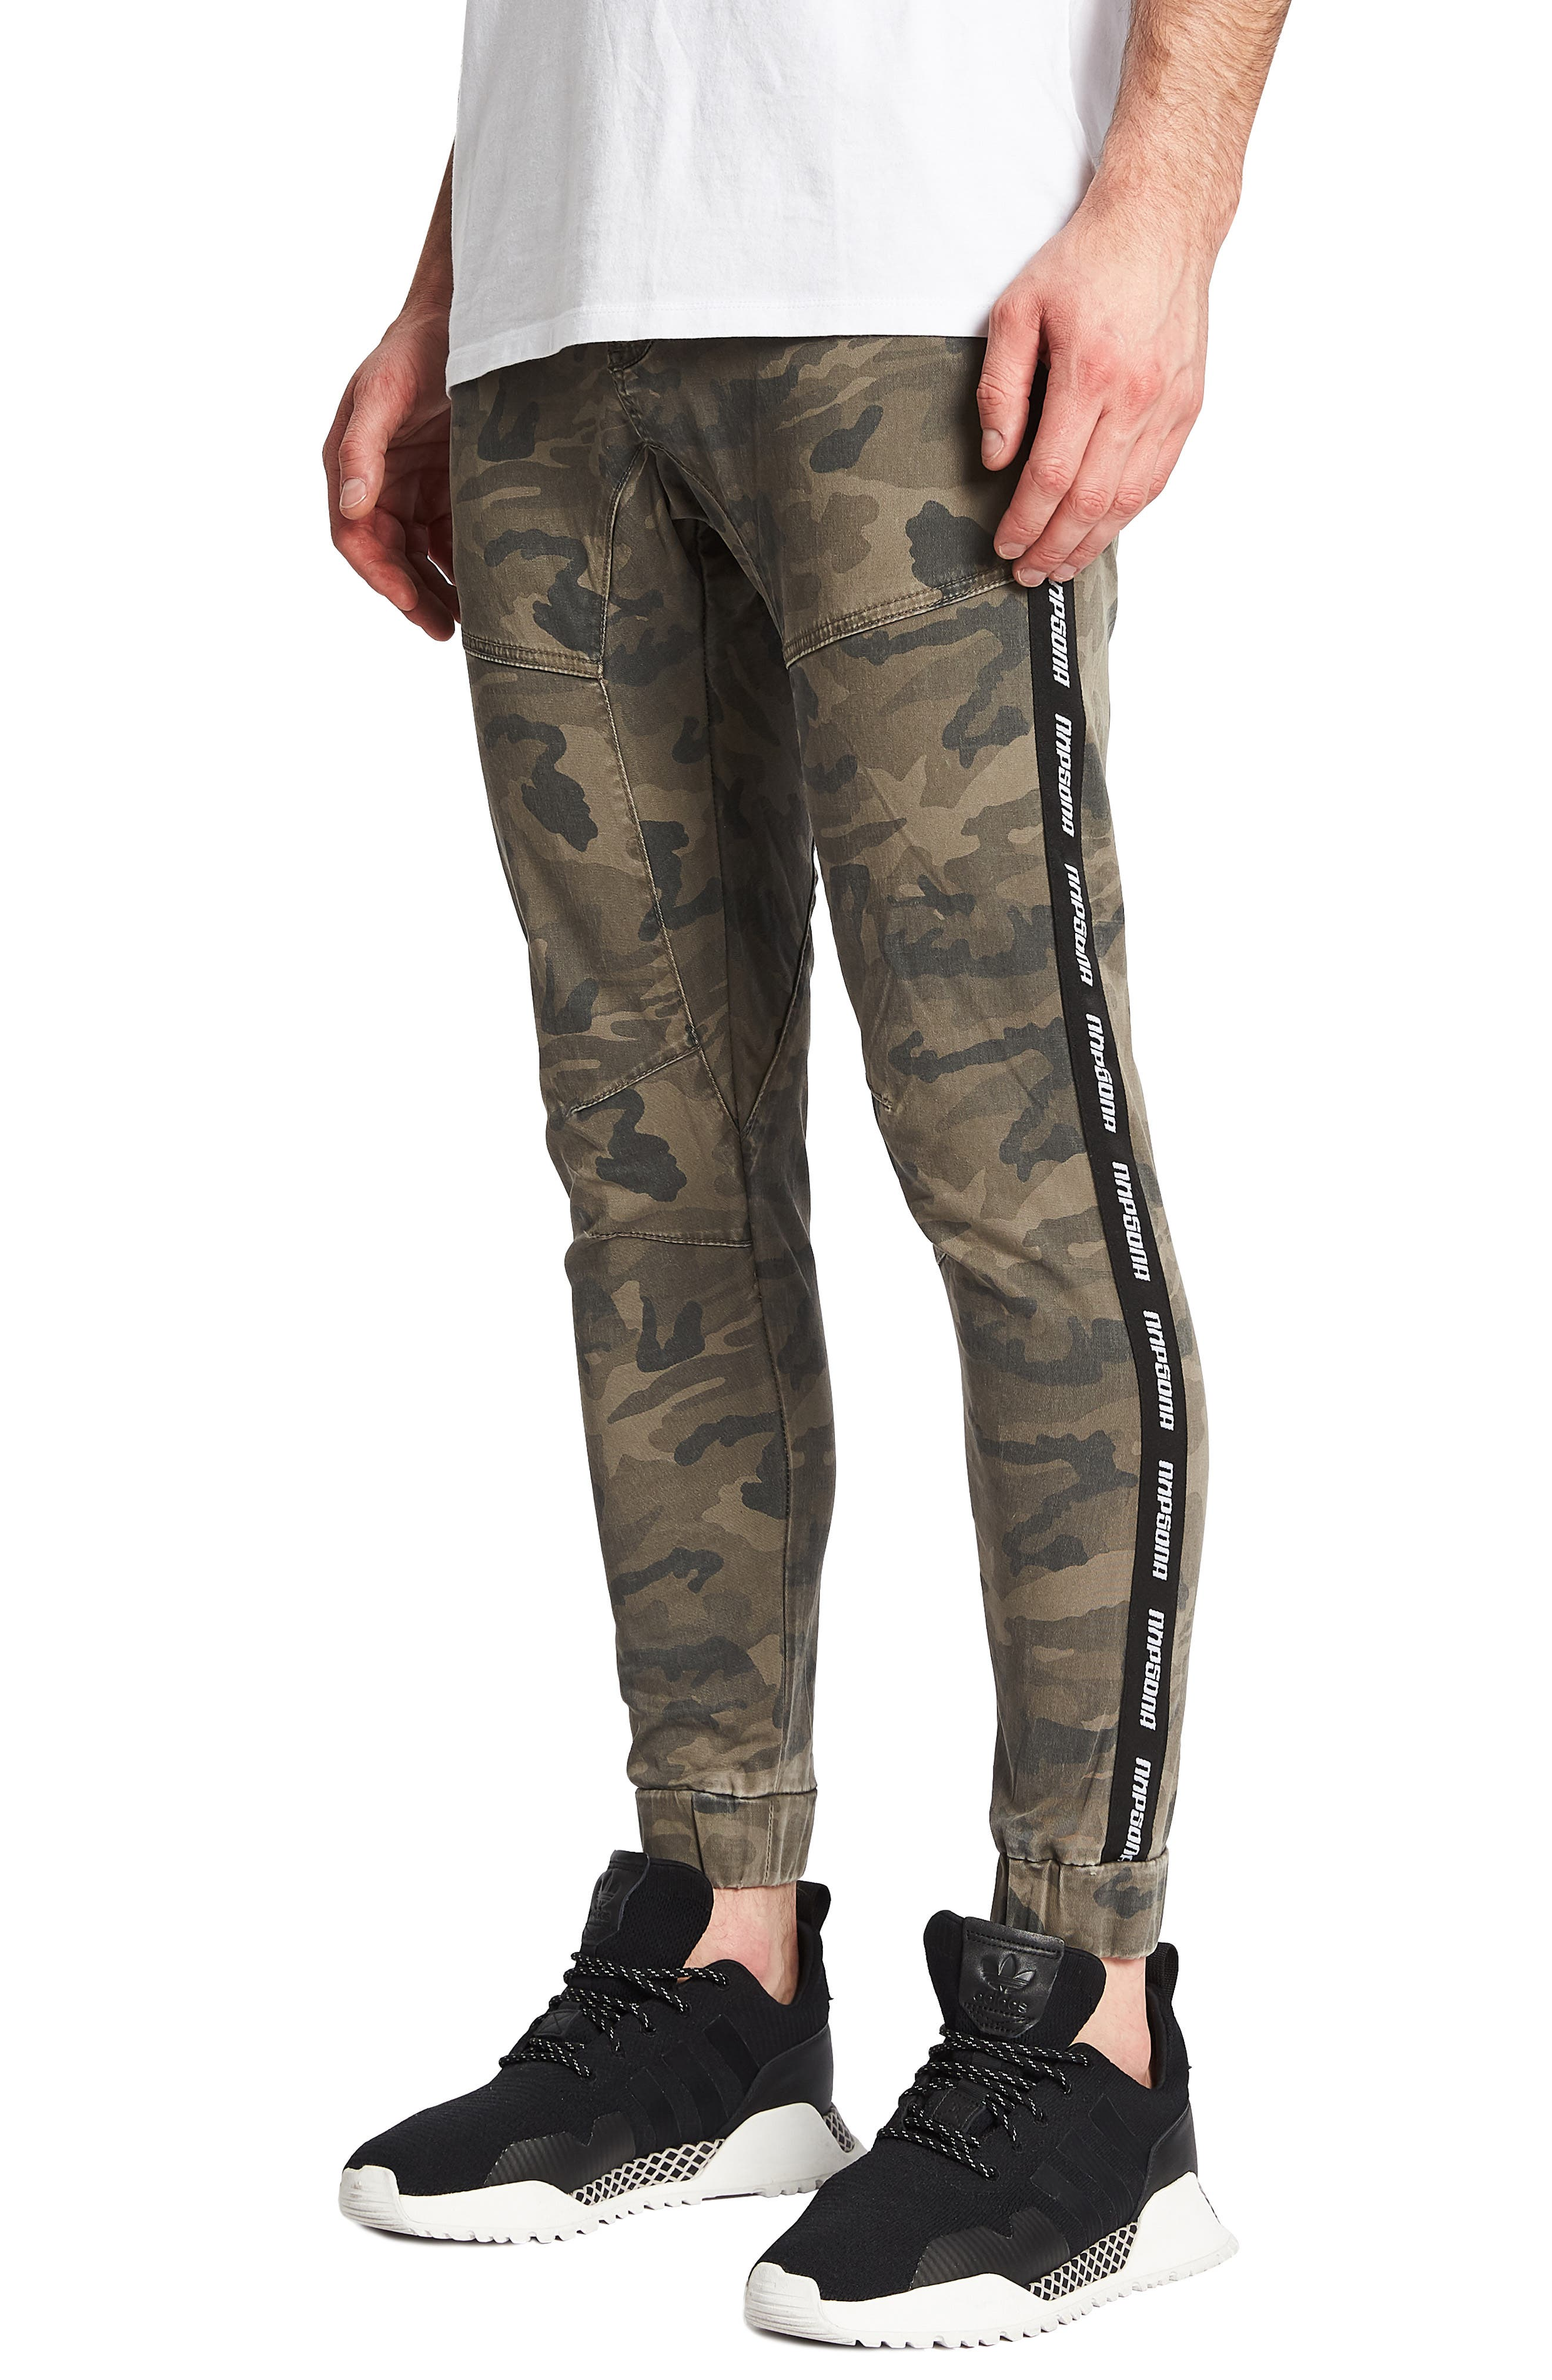 Firebrand Slim Fit Pants,                             Alternate thumbnail 3, color,                             AIRWOLF CAMO